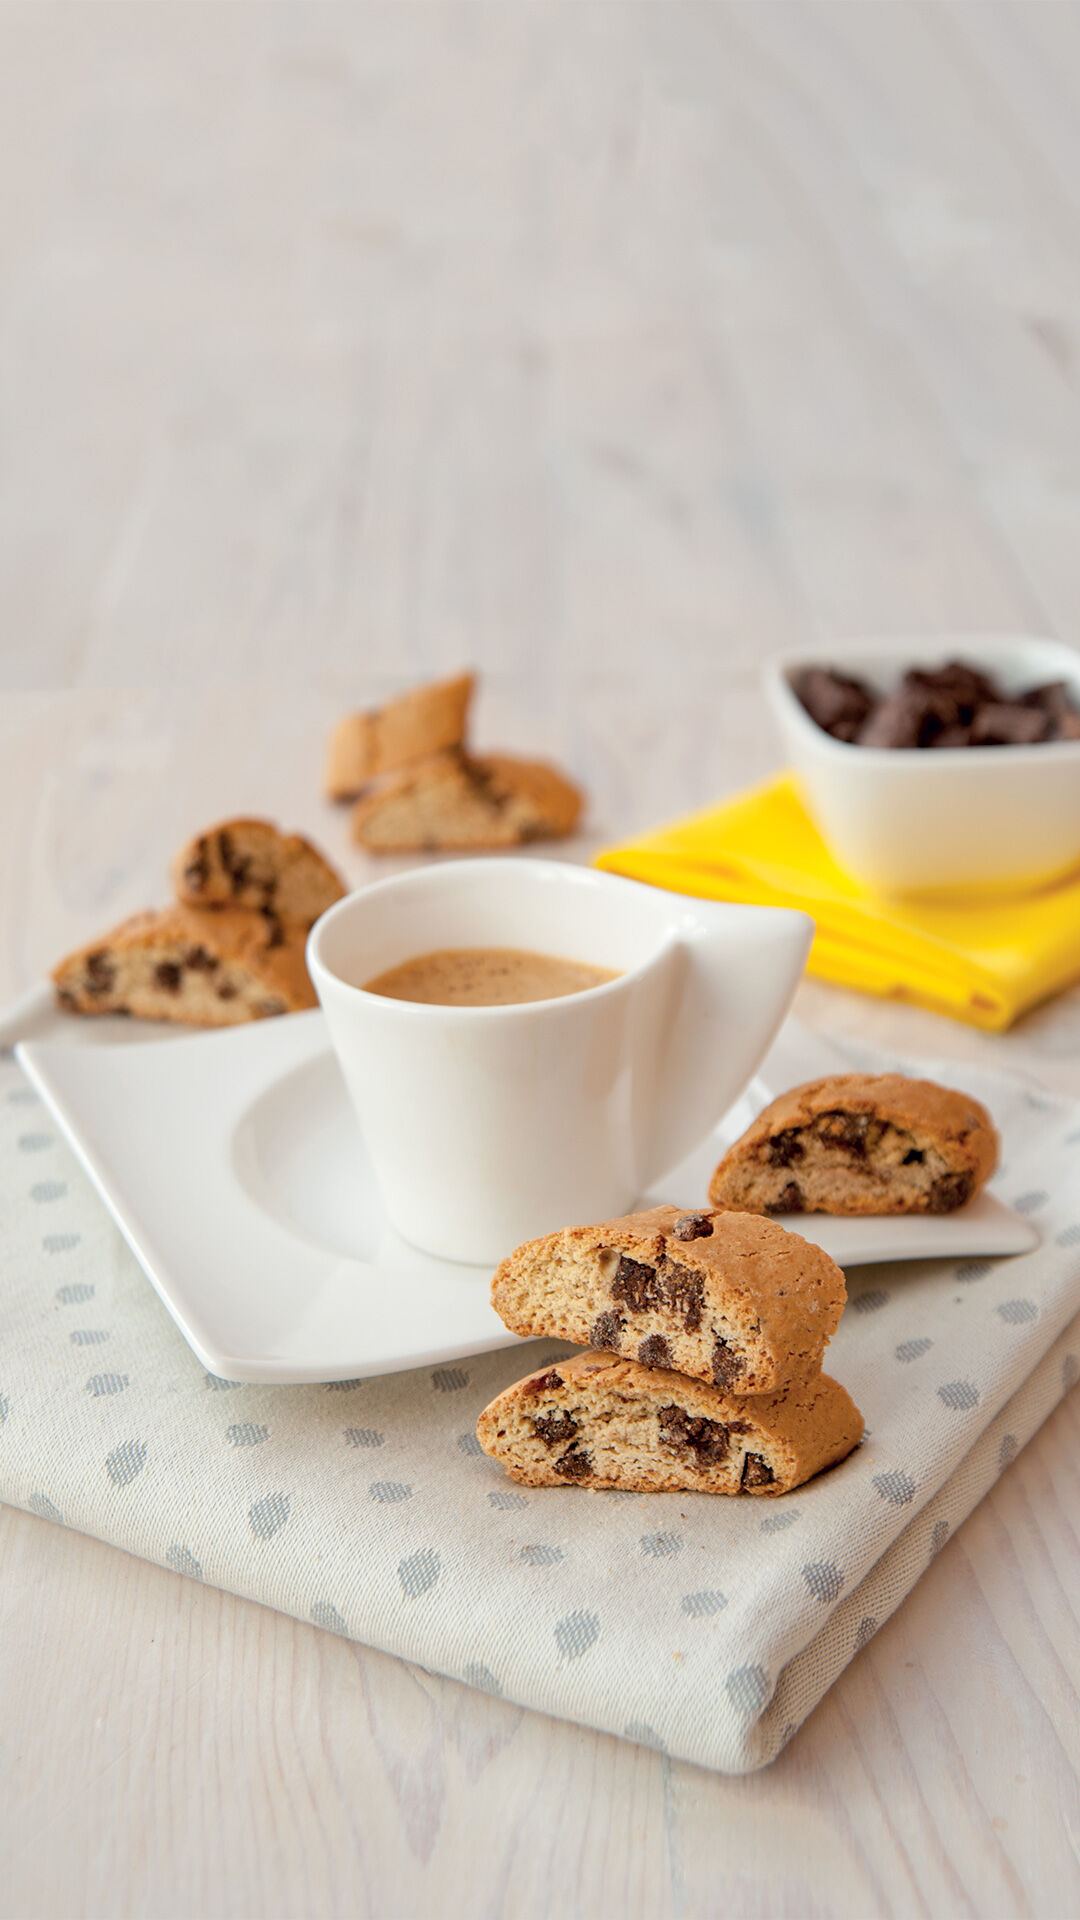 CNC - Cantuccini Au Chocolat